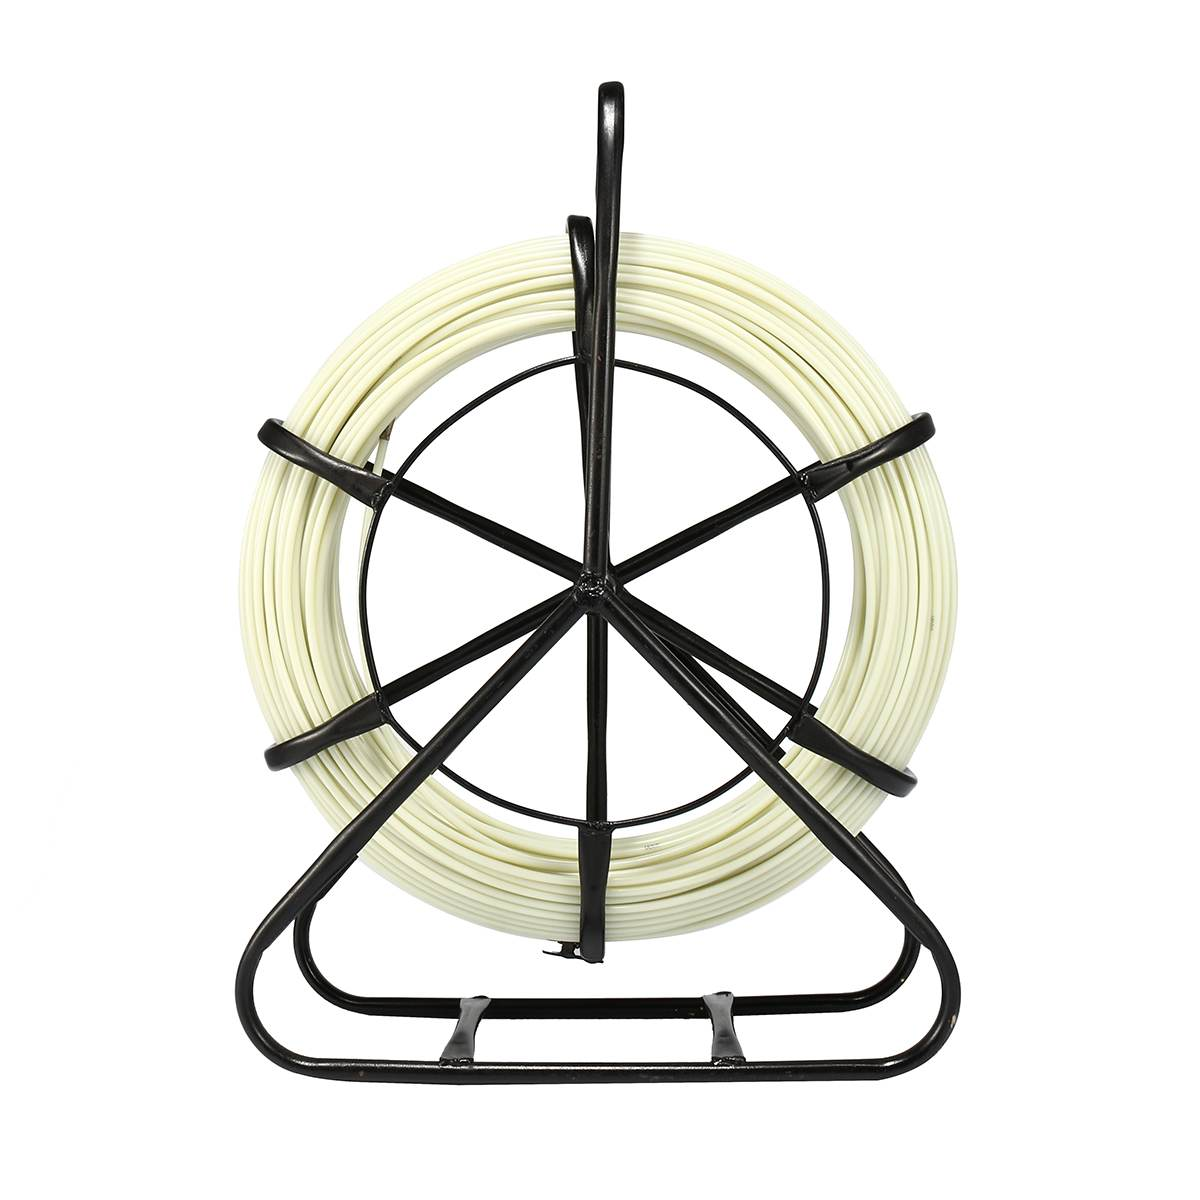 4,8 мм 100 м Рыбная лента Стекловолоконная катушка провод кабель ходовой шток канал Rodder Fishtape Съемник